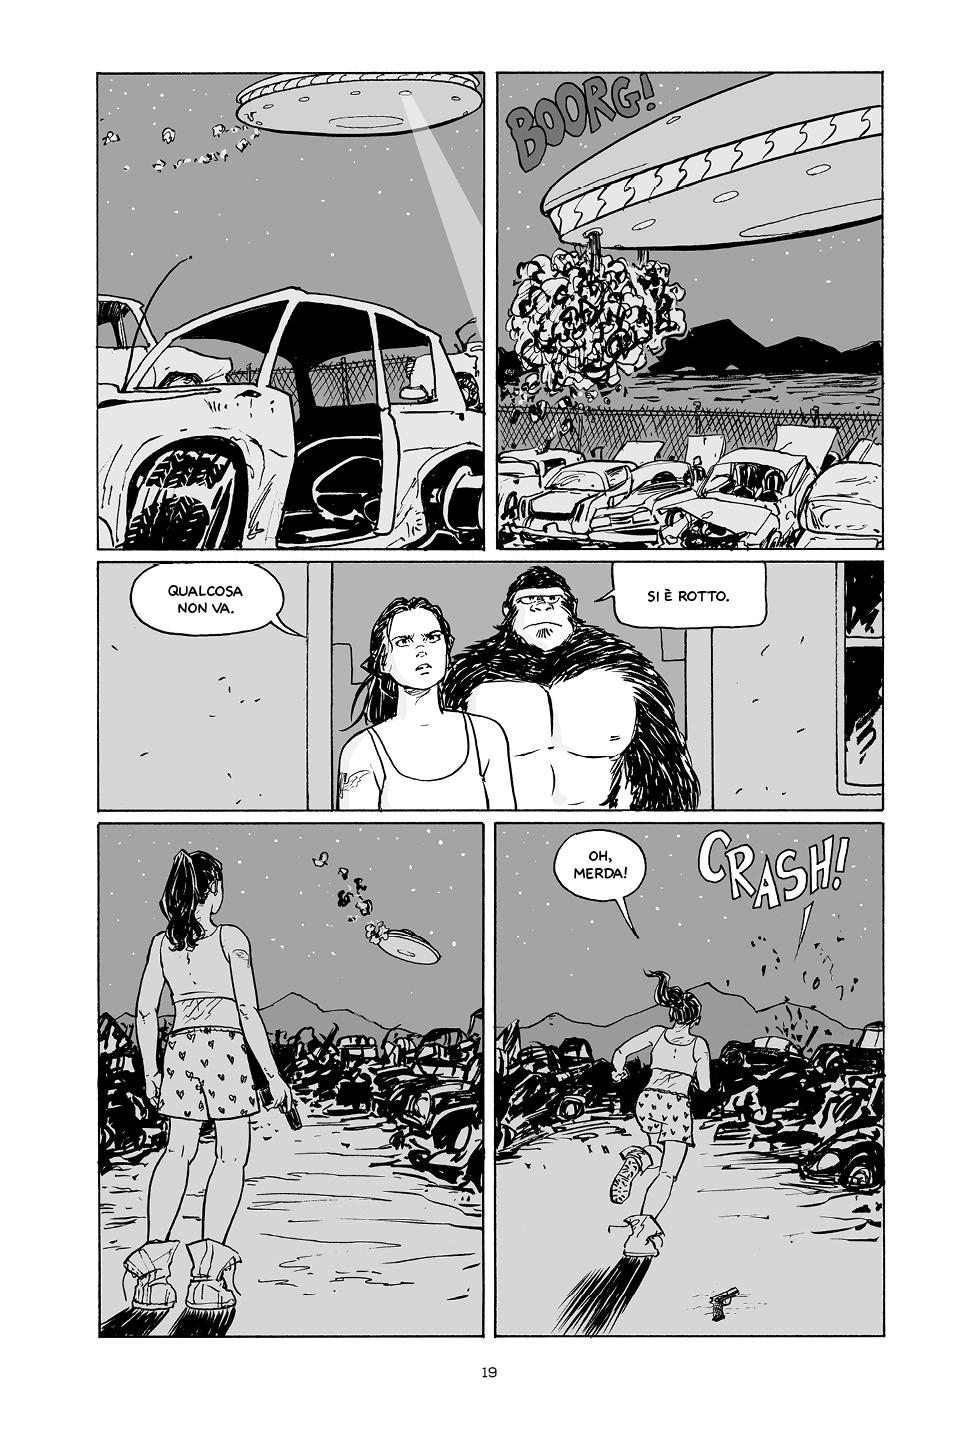 Motorgirl, pagina 19